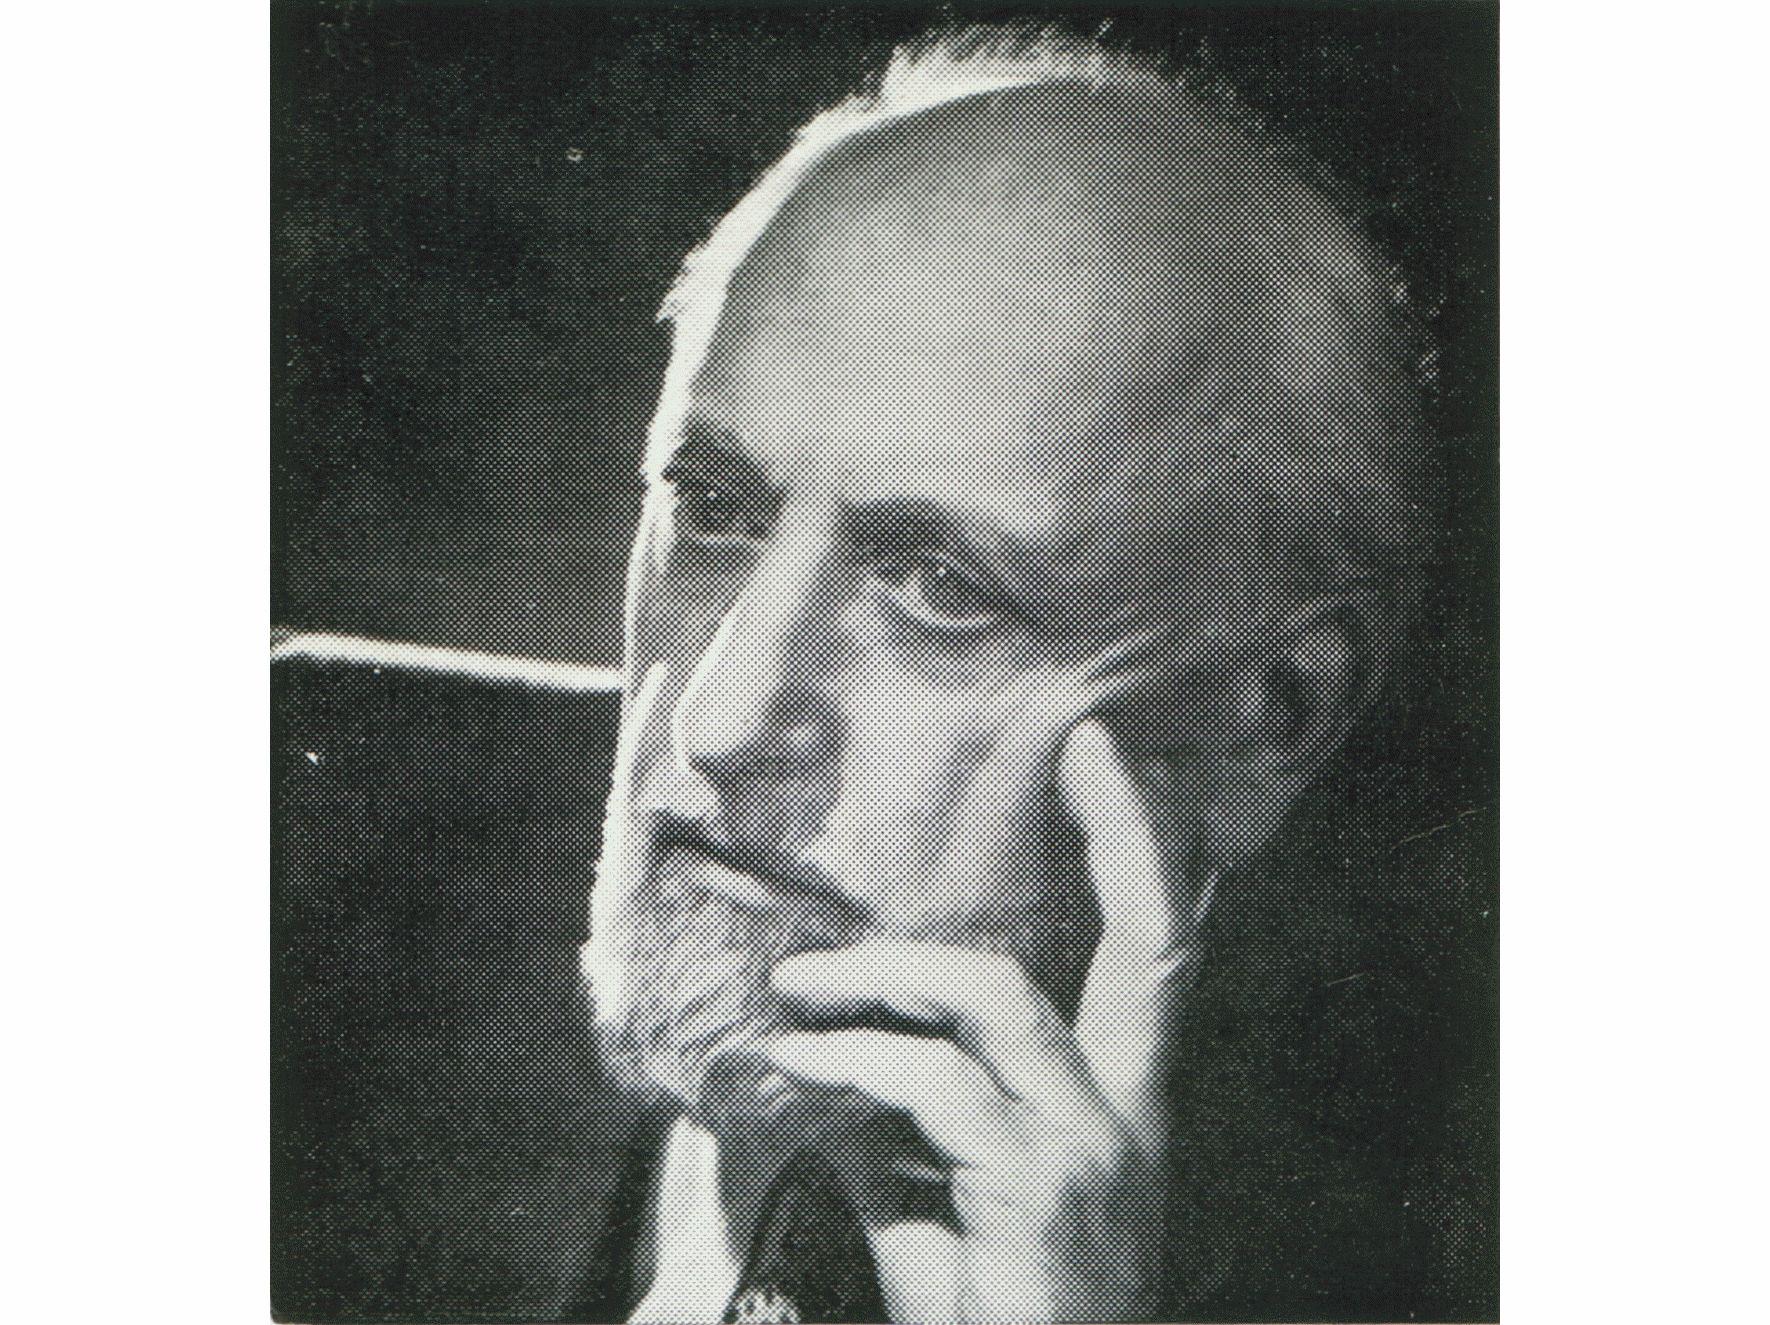 L. van Beethoven, Symphonie No 5, OSR, Ernest Ansermet, 1962 (concert)